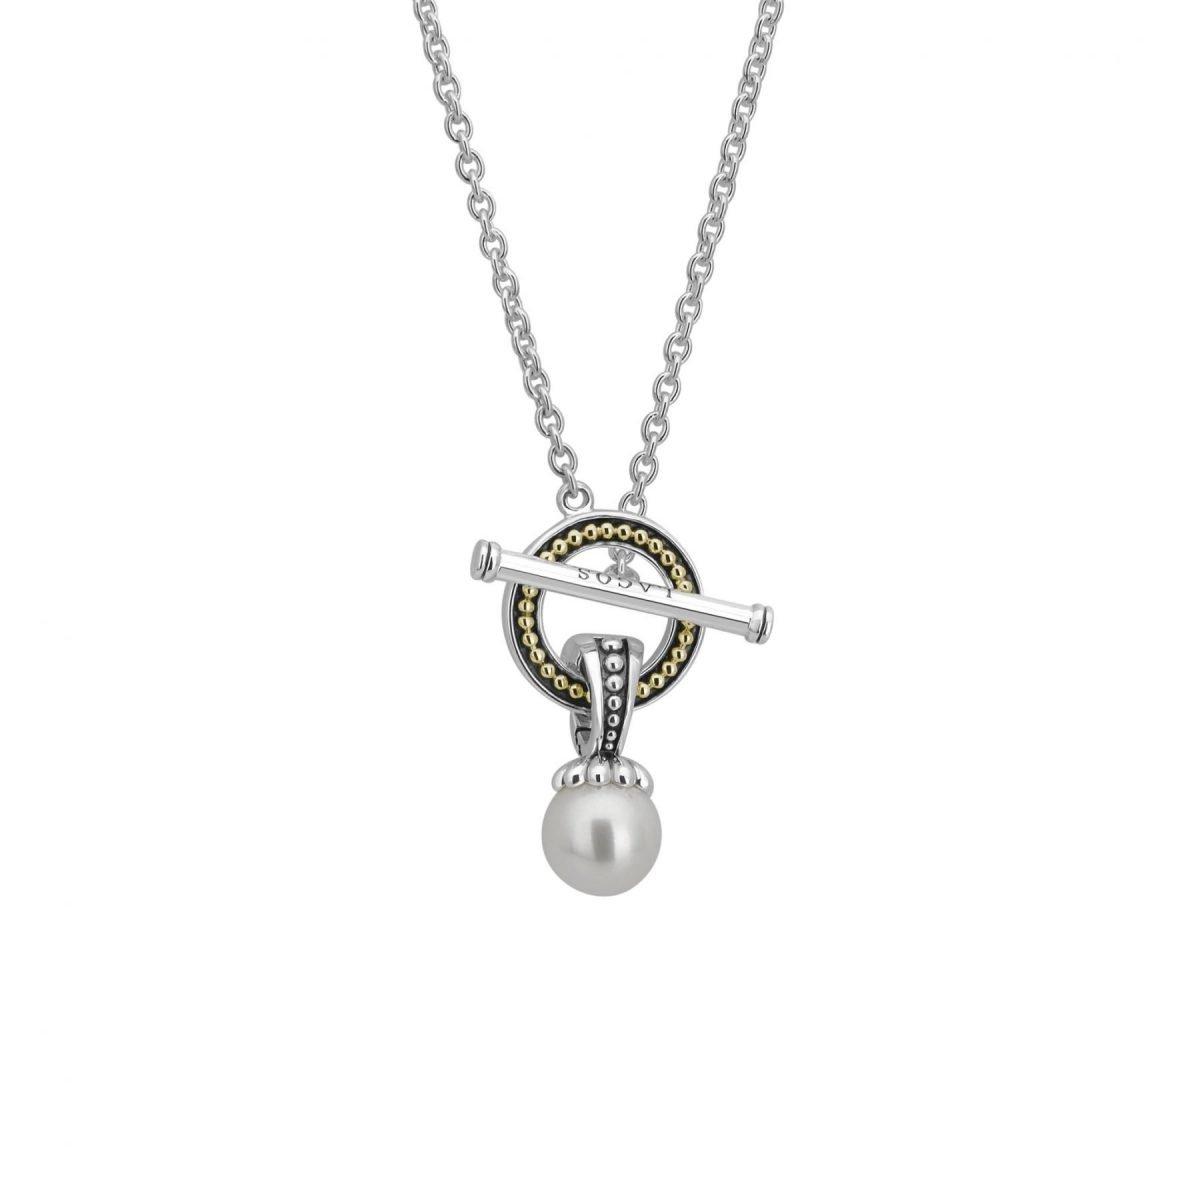 Luna Pearl Toggle Necklace